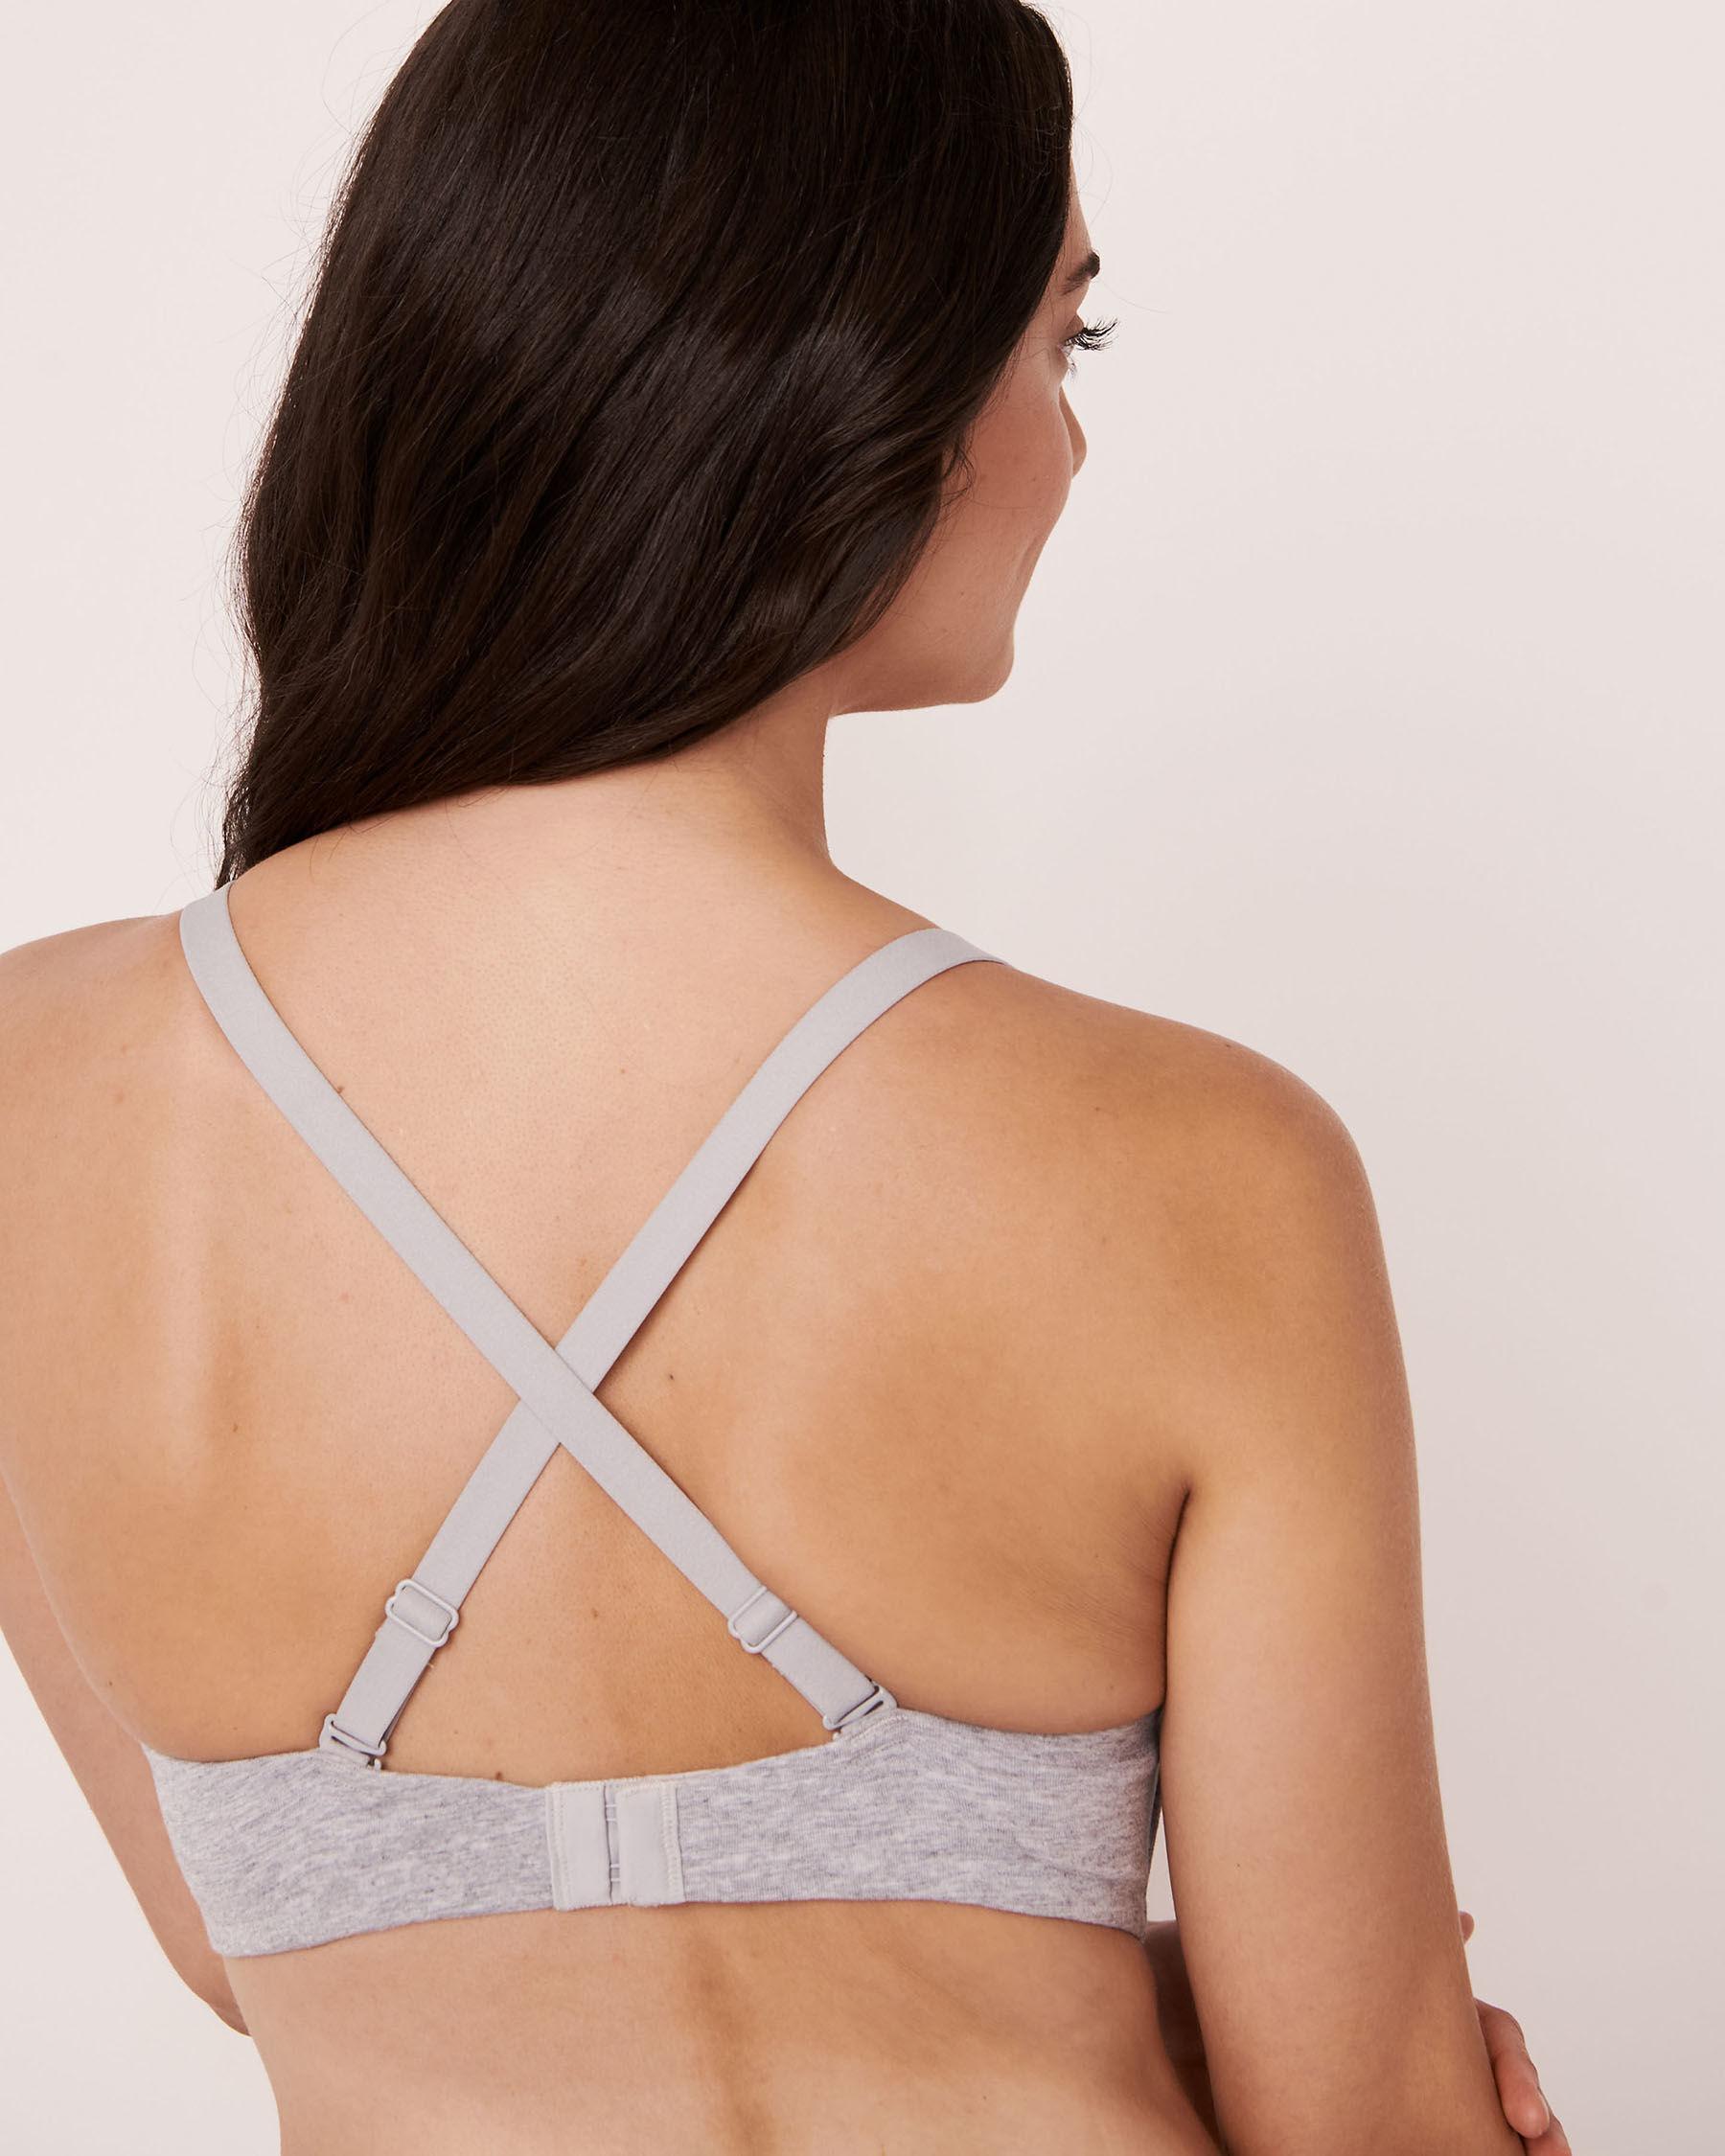 LA VIE EN ROSE Nursing Lightly Lined Wireless Cotton Bra Grey mix 10200042 - View5